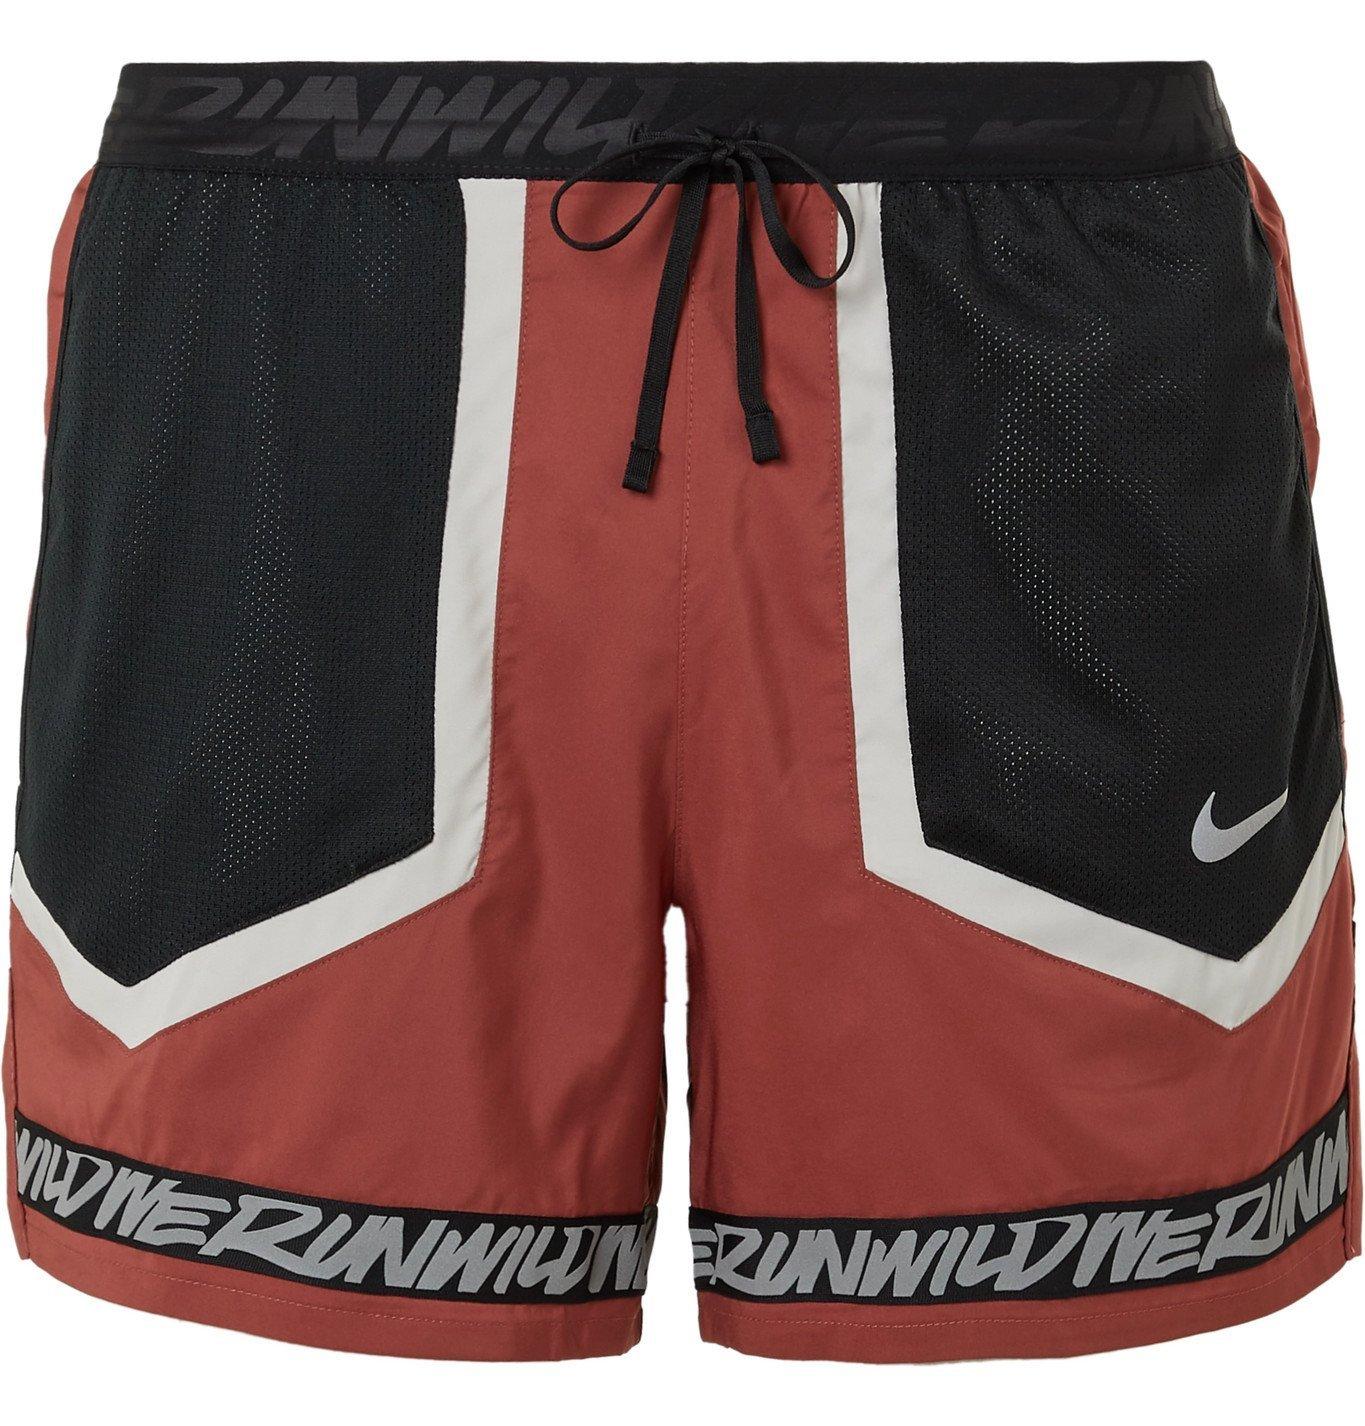 Nike Running - Flex Stride Wild Run Printed Running Shorts - Red